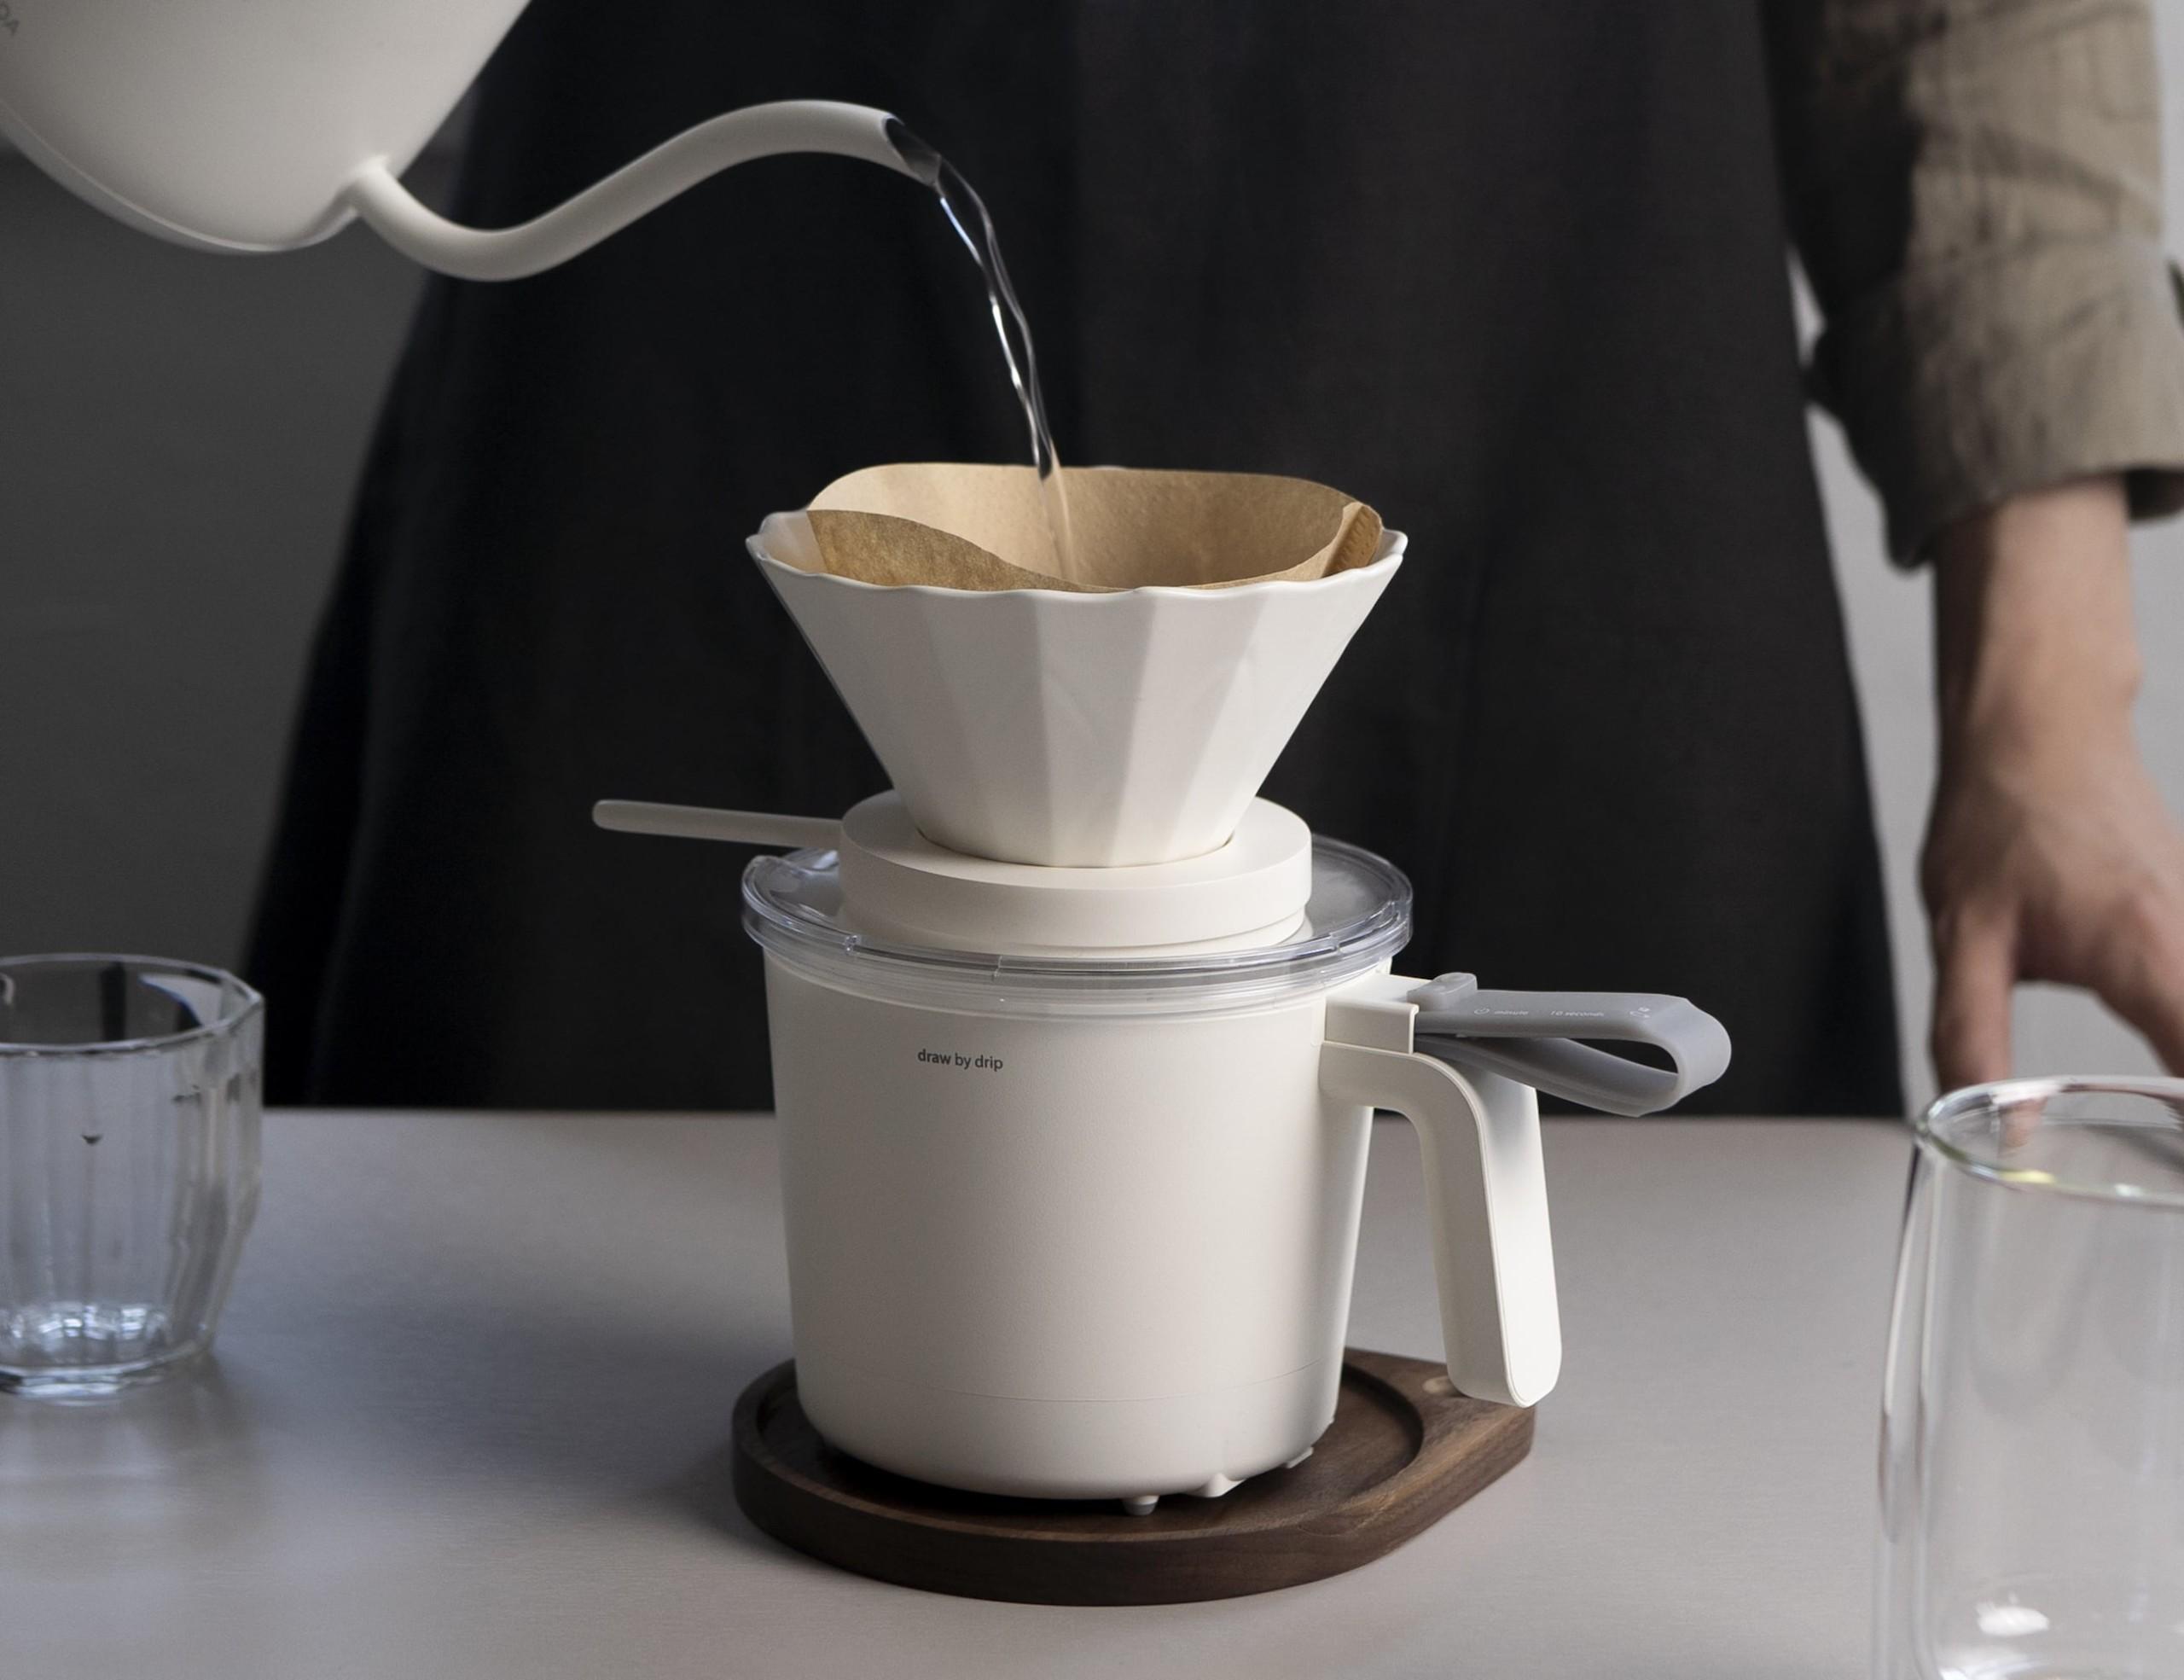 Draw by Drip Coffee Server